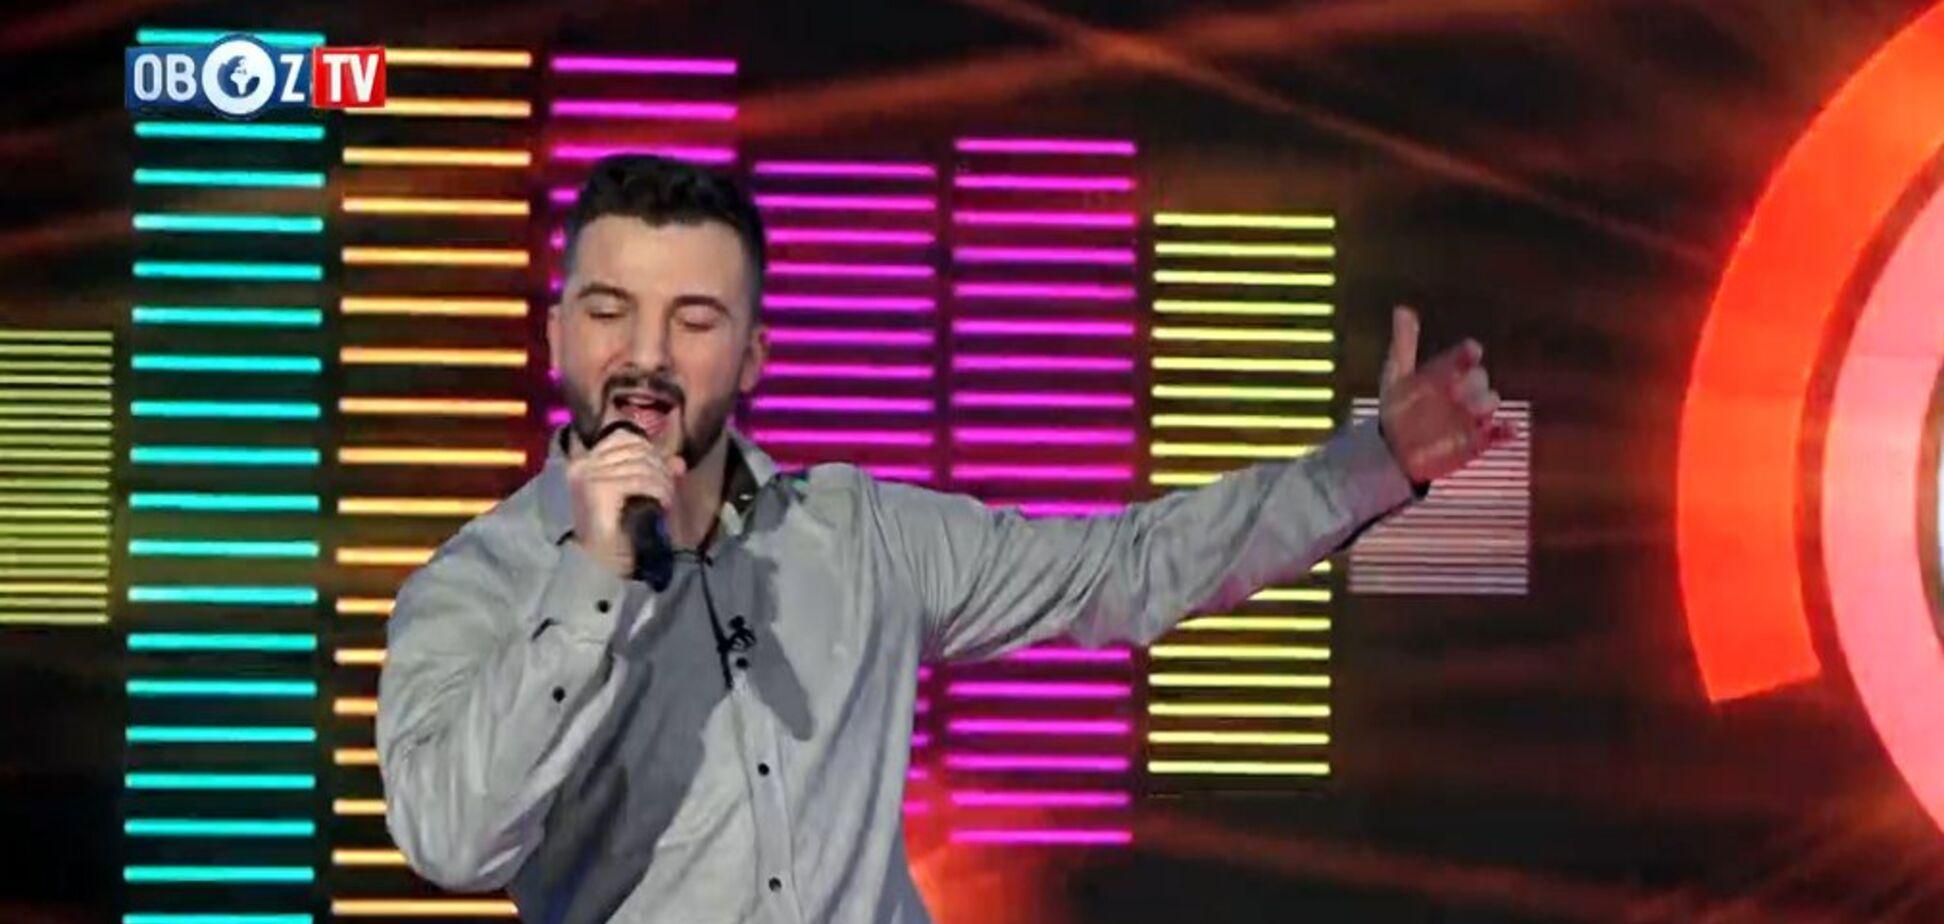 Співак, хореограф Сергій Костецький став гостем прямого етеру ObozTV